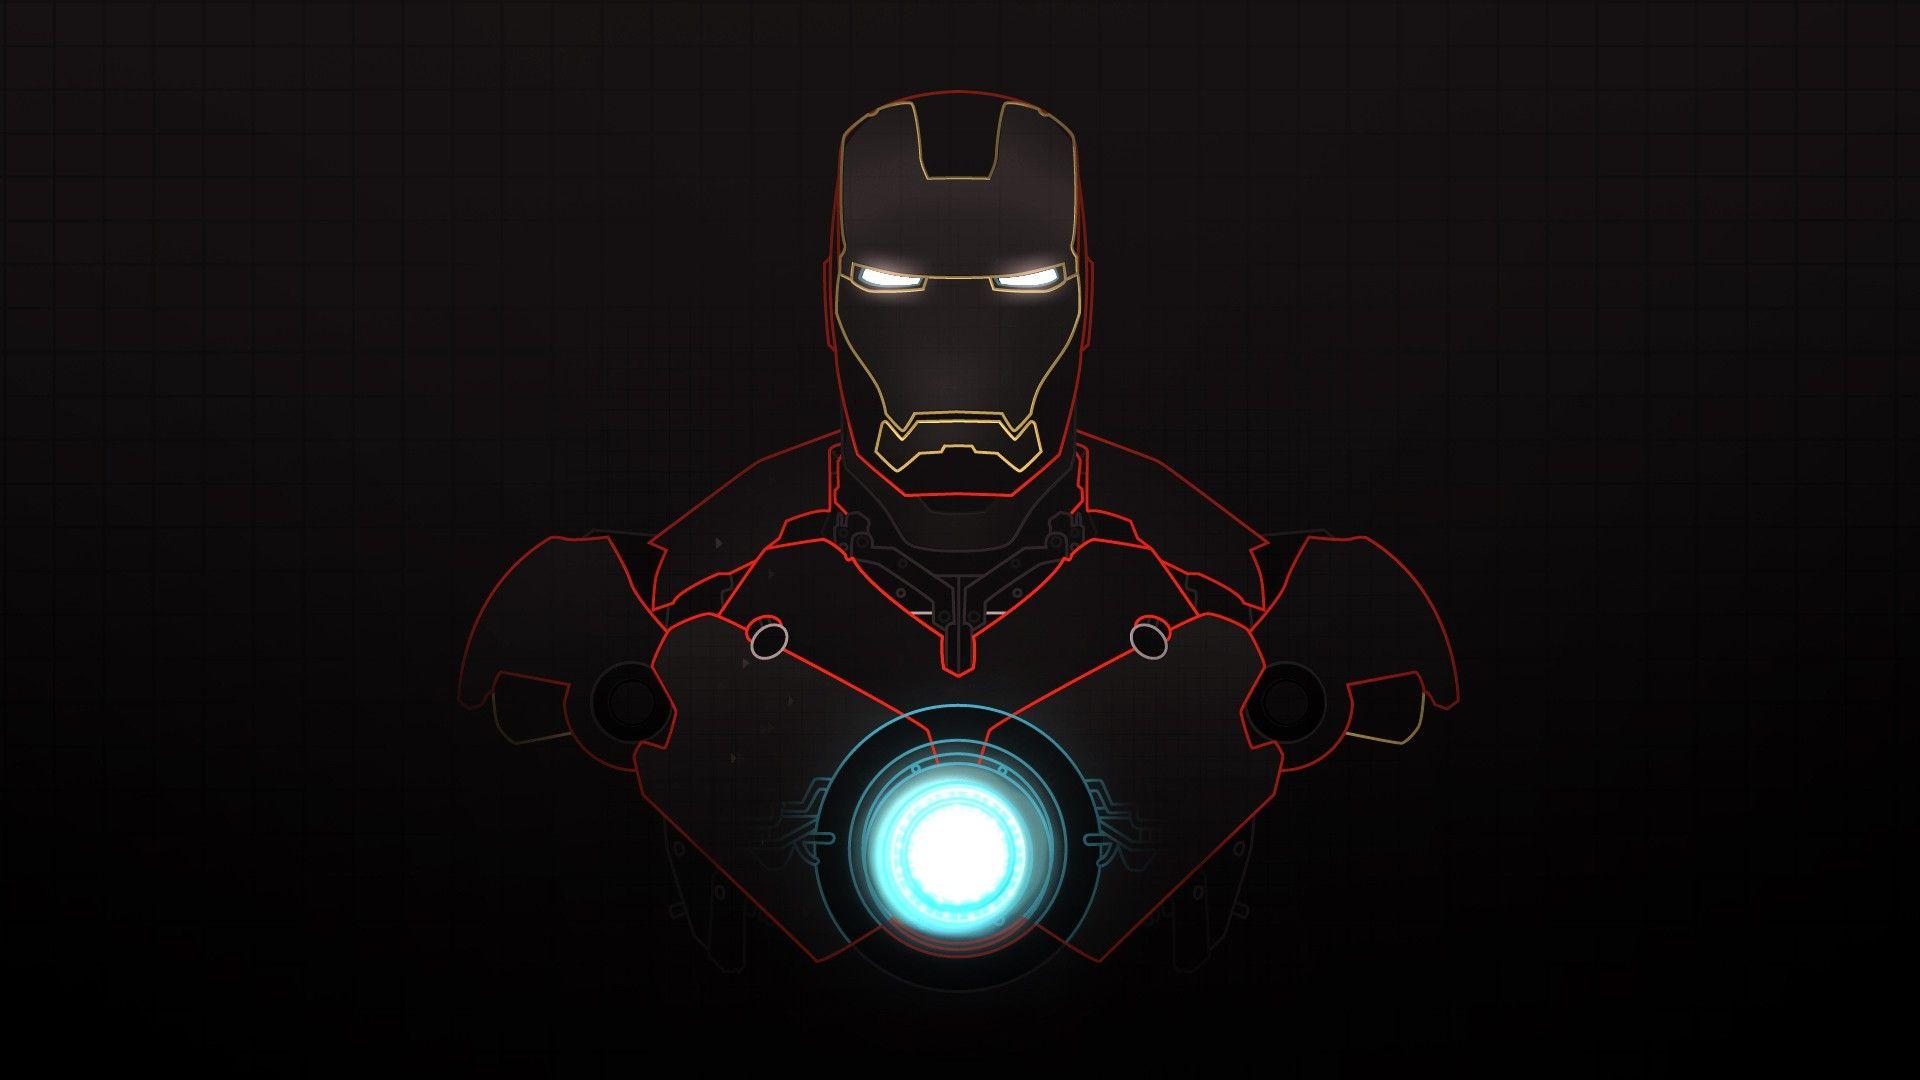 Iron Man Vector Artwork Marvel Comics Graphic Art 1920x1080 Wallpaper Iron Man Wallpaper Man Wallpaper Iron Man Hd Wallpaper